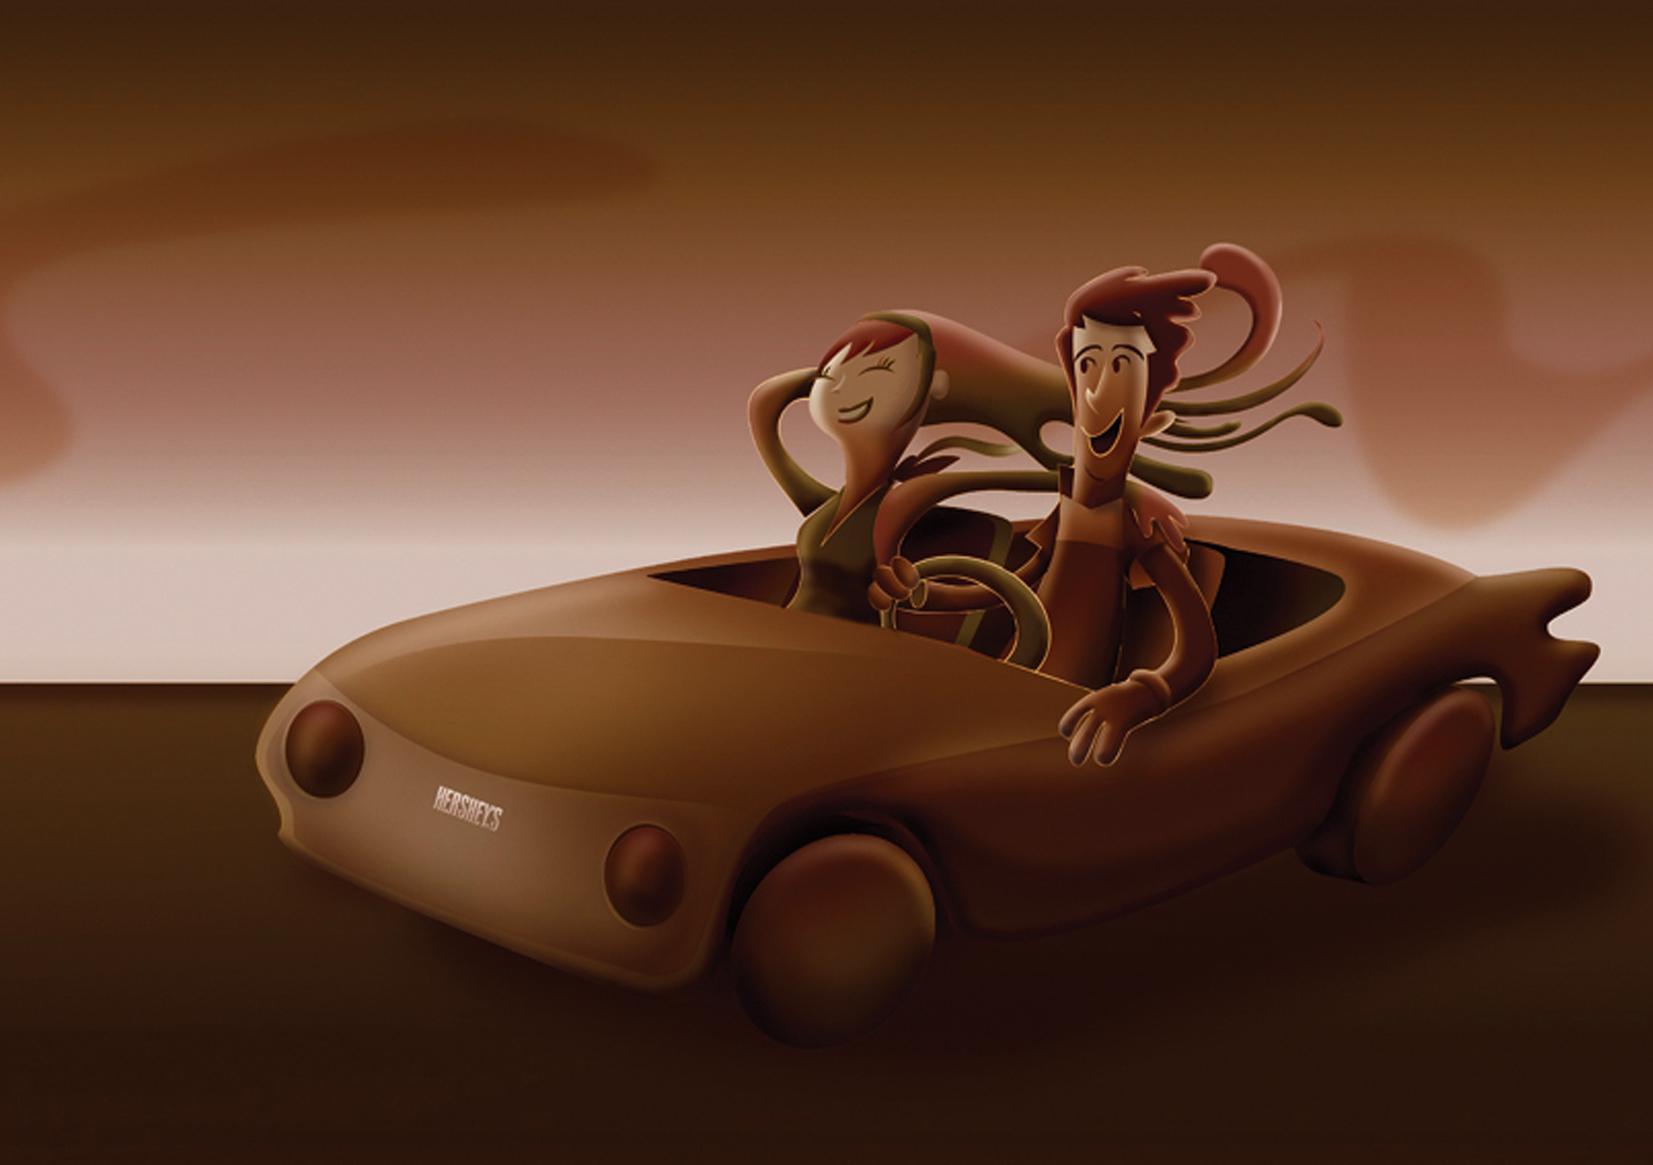 Hersheys Car